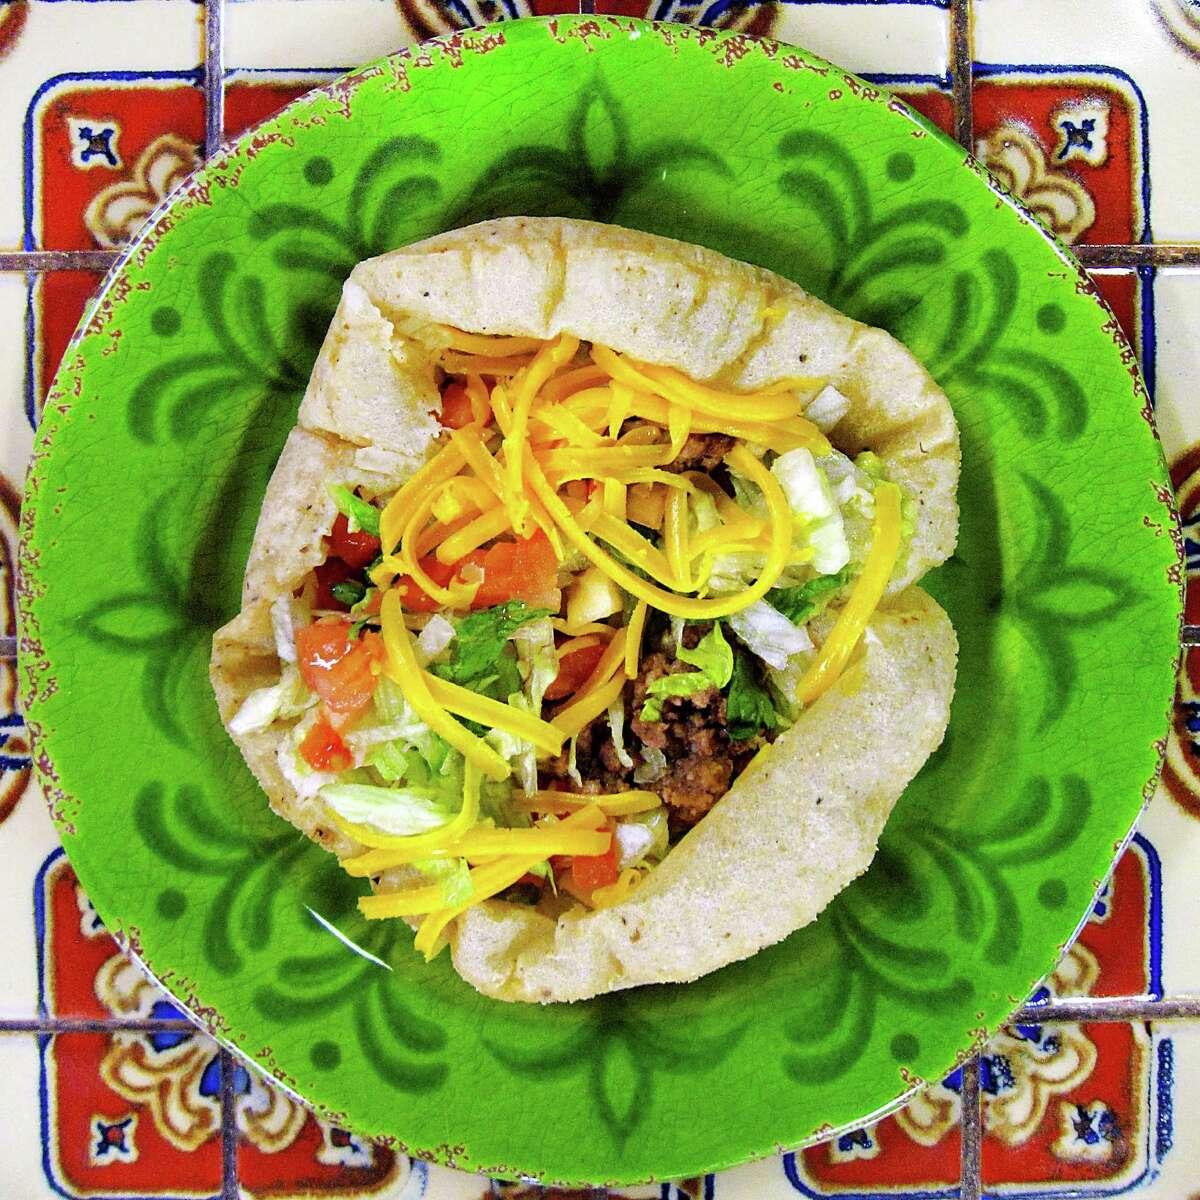 Netflix featured local restaurant Teka Molino in its season 2 series of